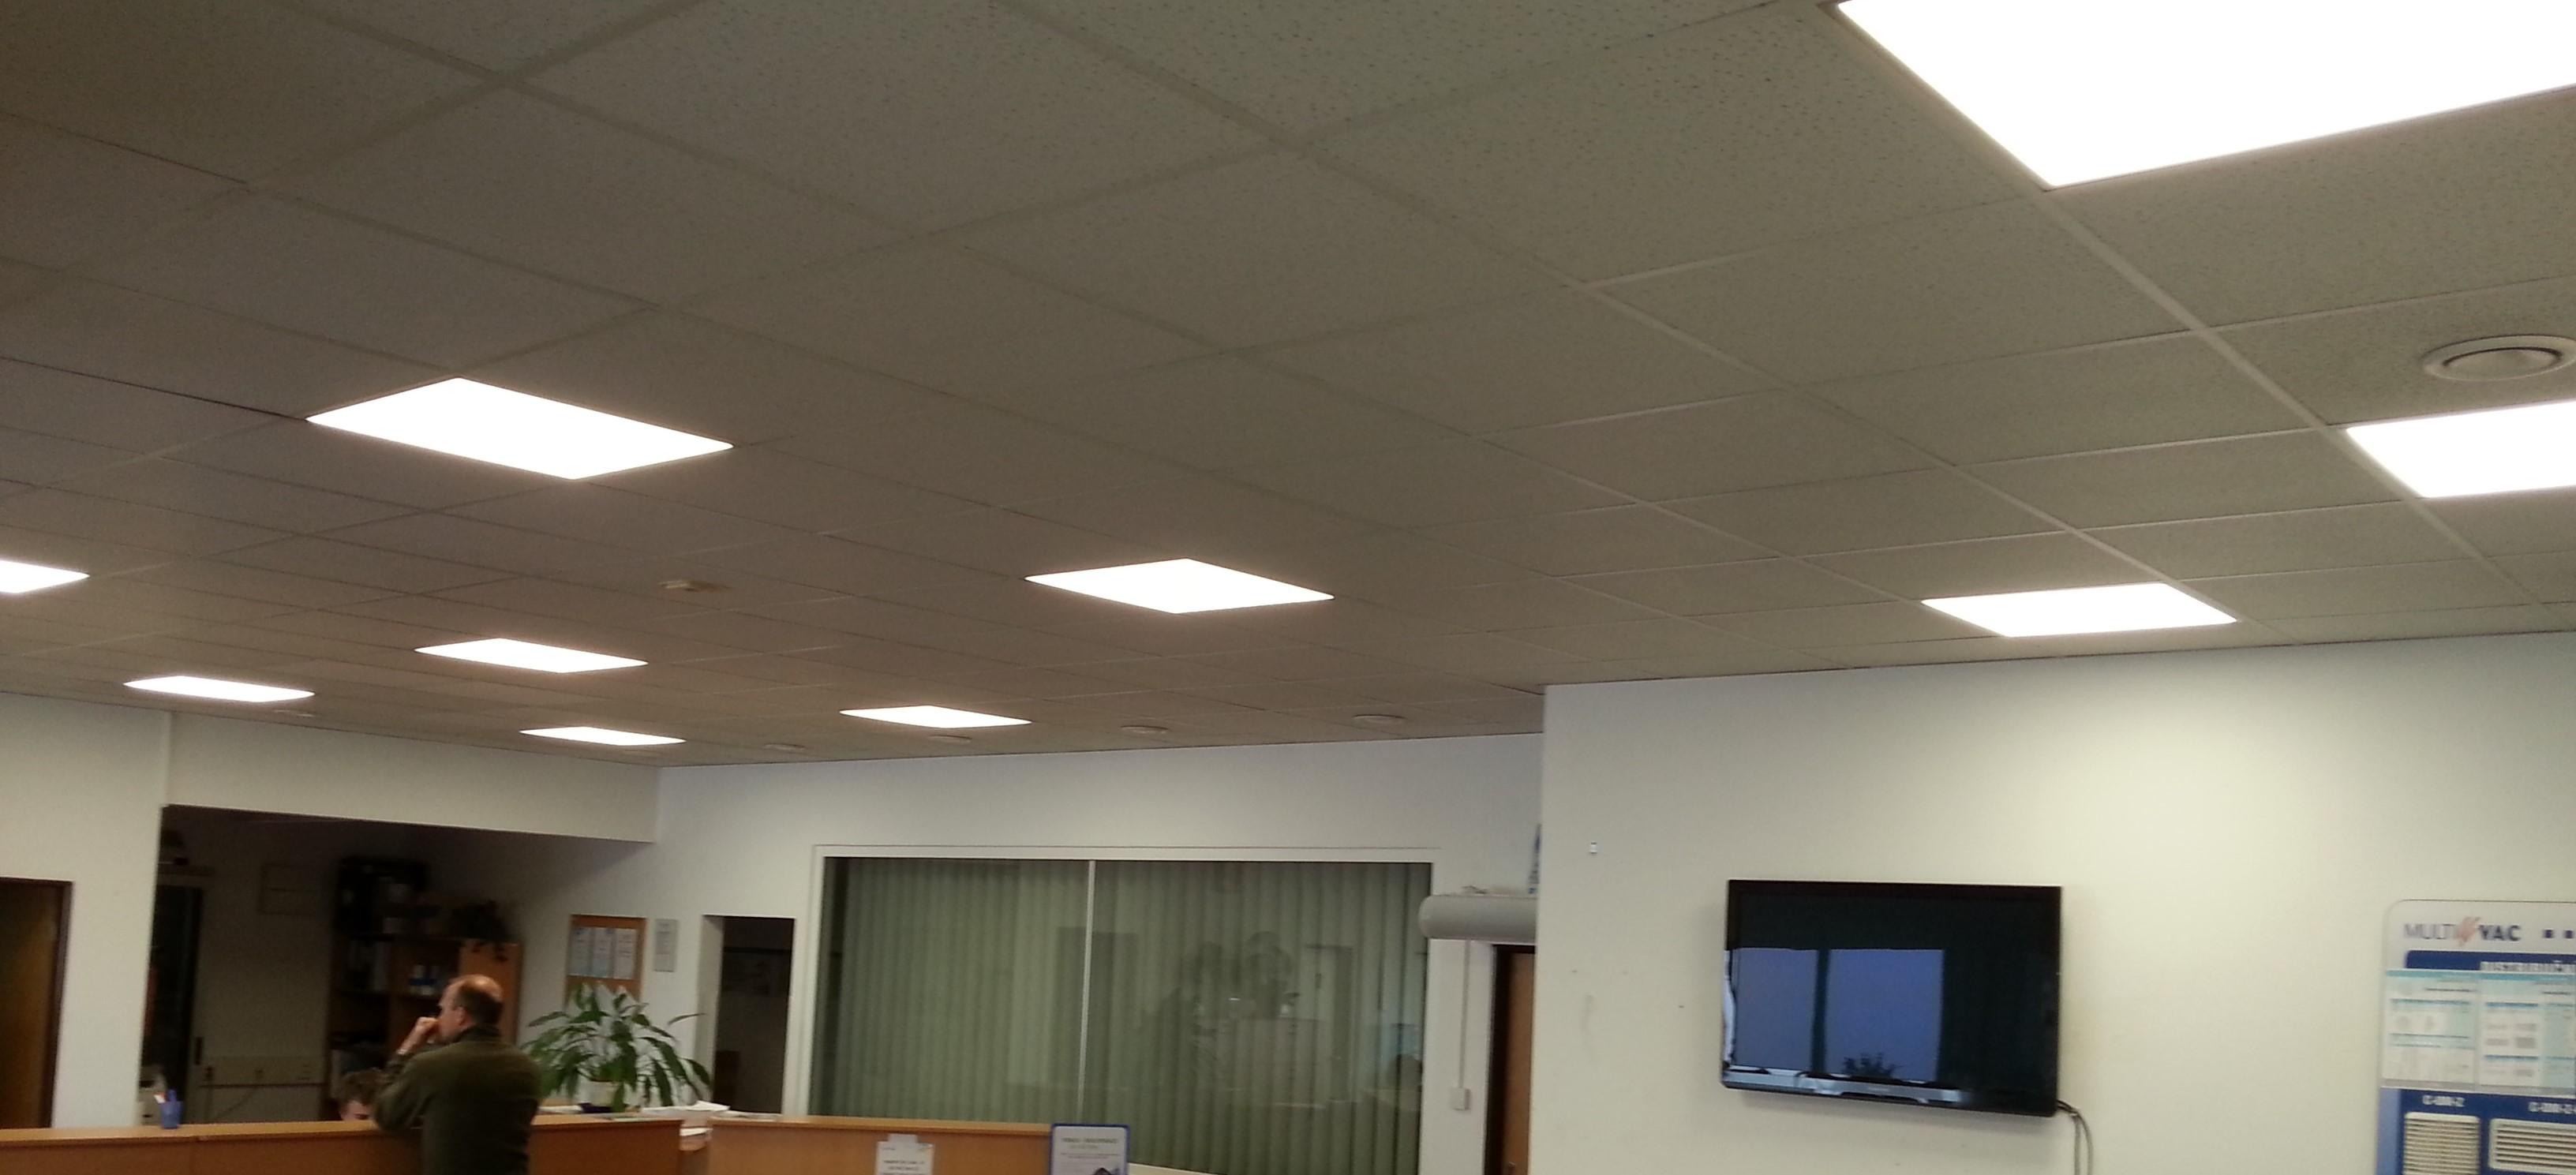 LED_panel_snadna_montaz_atipicky_rozmer_62x62_levne_kvalitni_rychla_montaz_poradit_ukazky